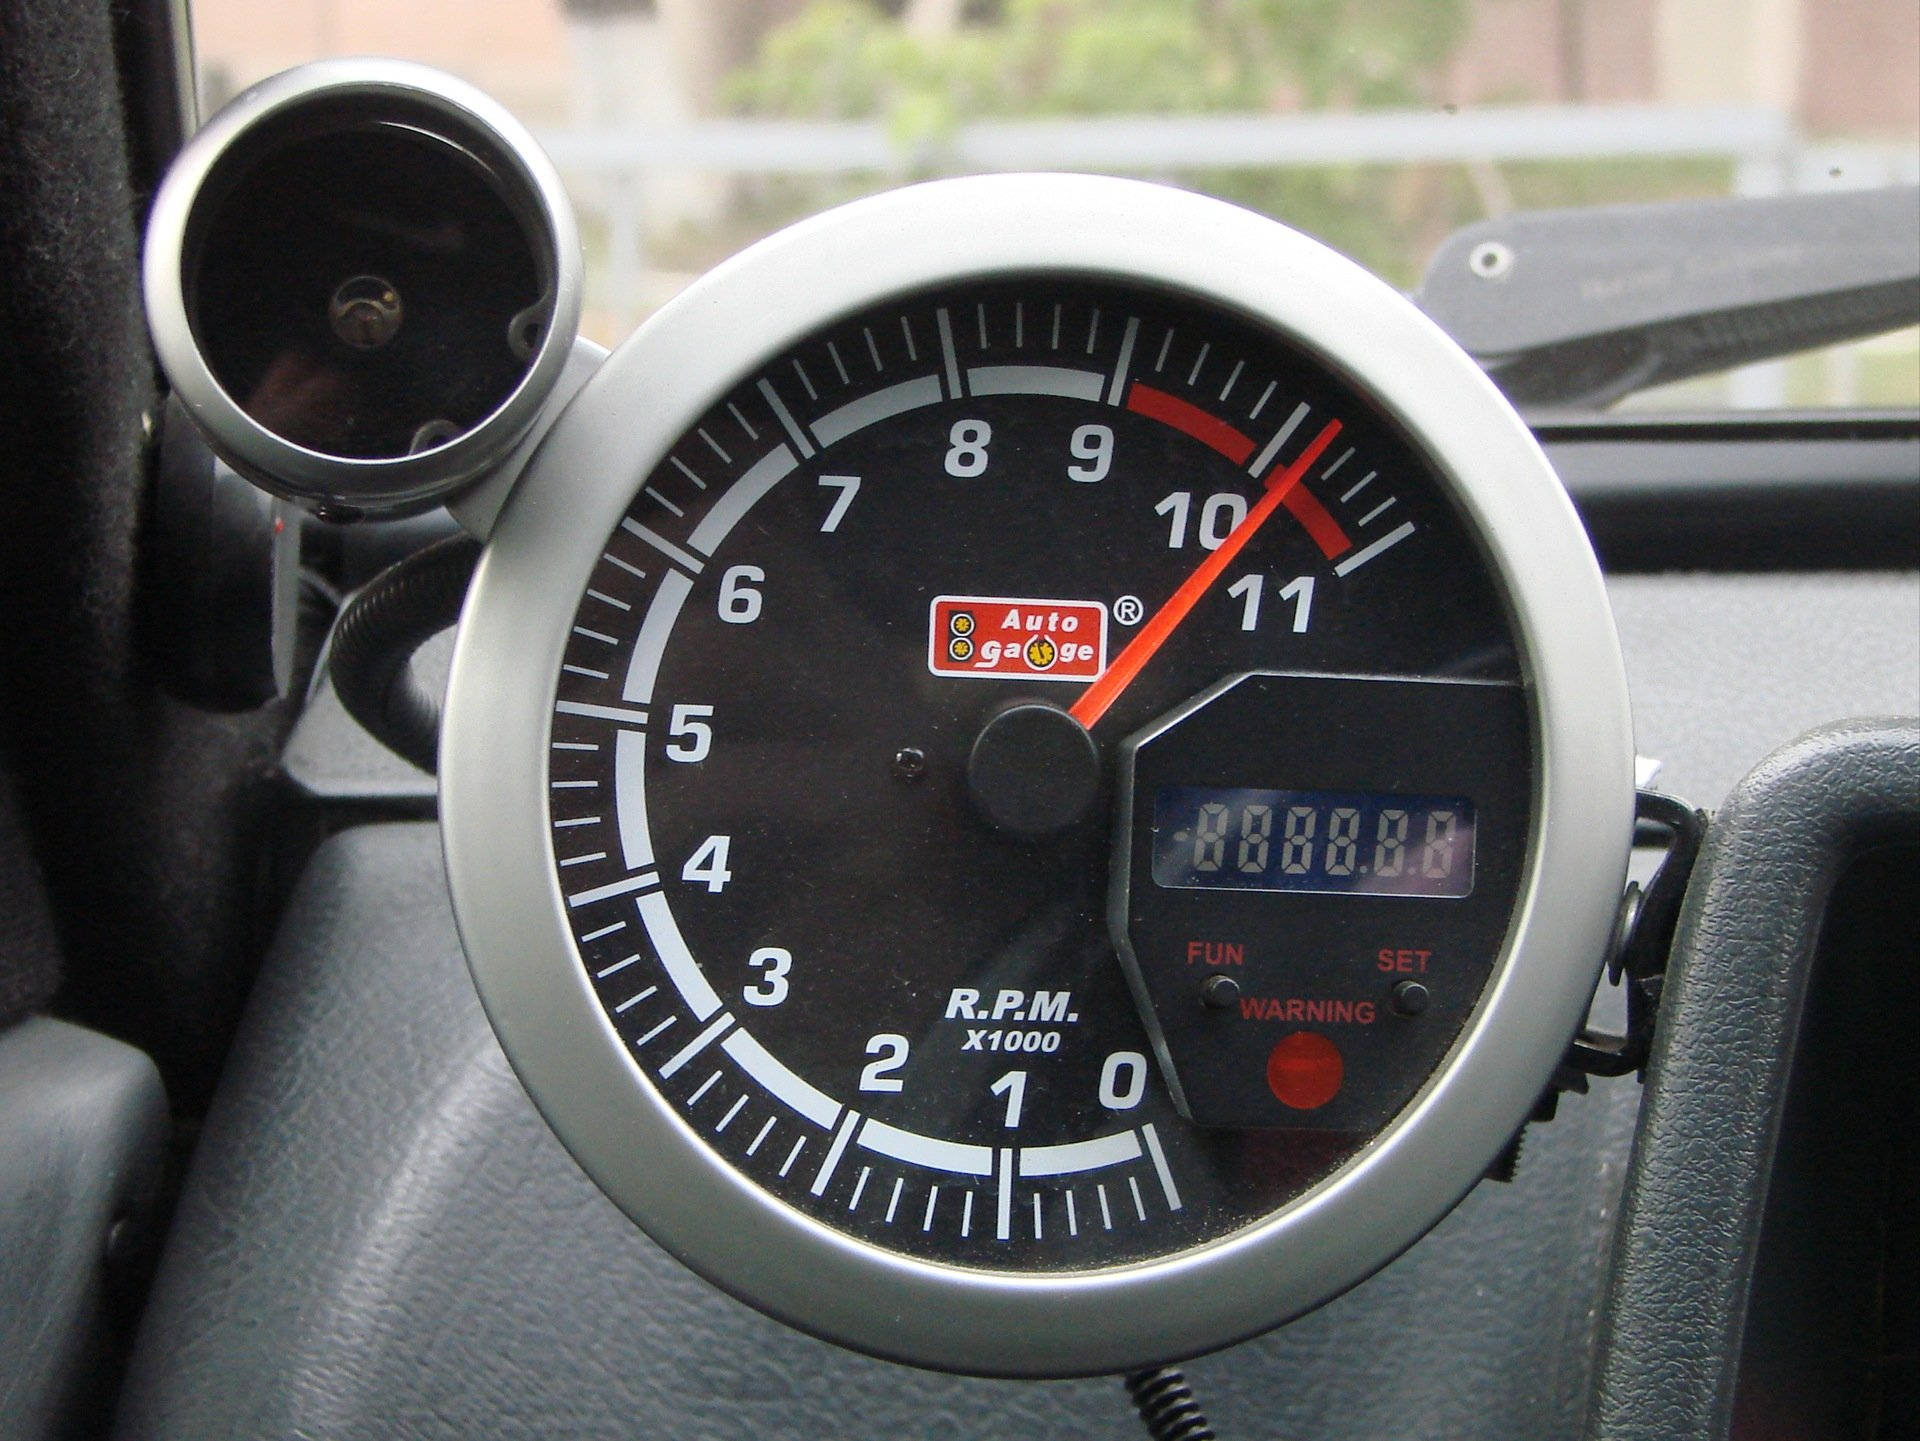 Индикатор отсечки оборотов двигателя